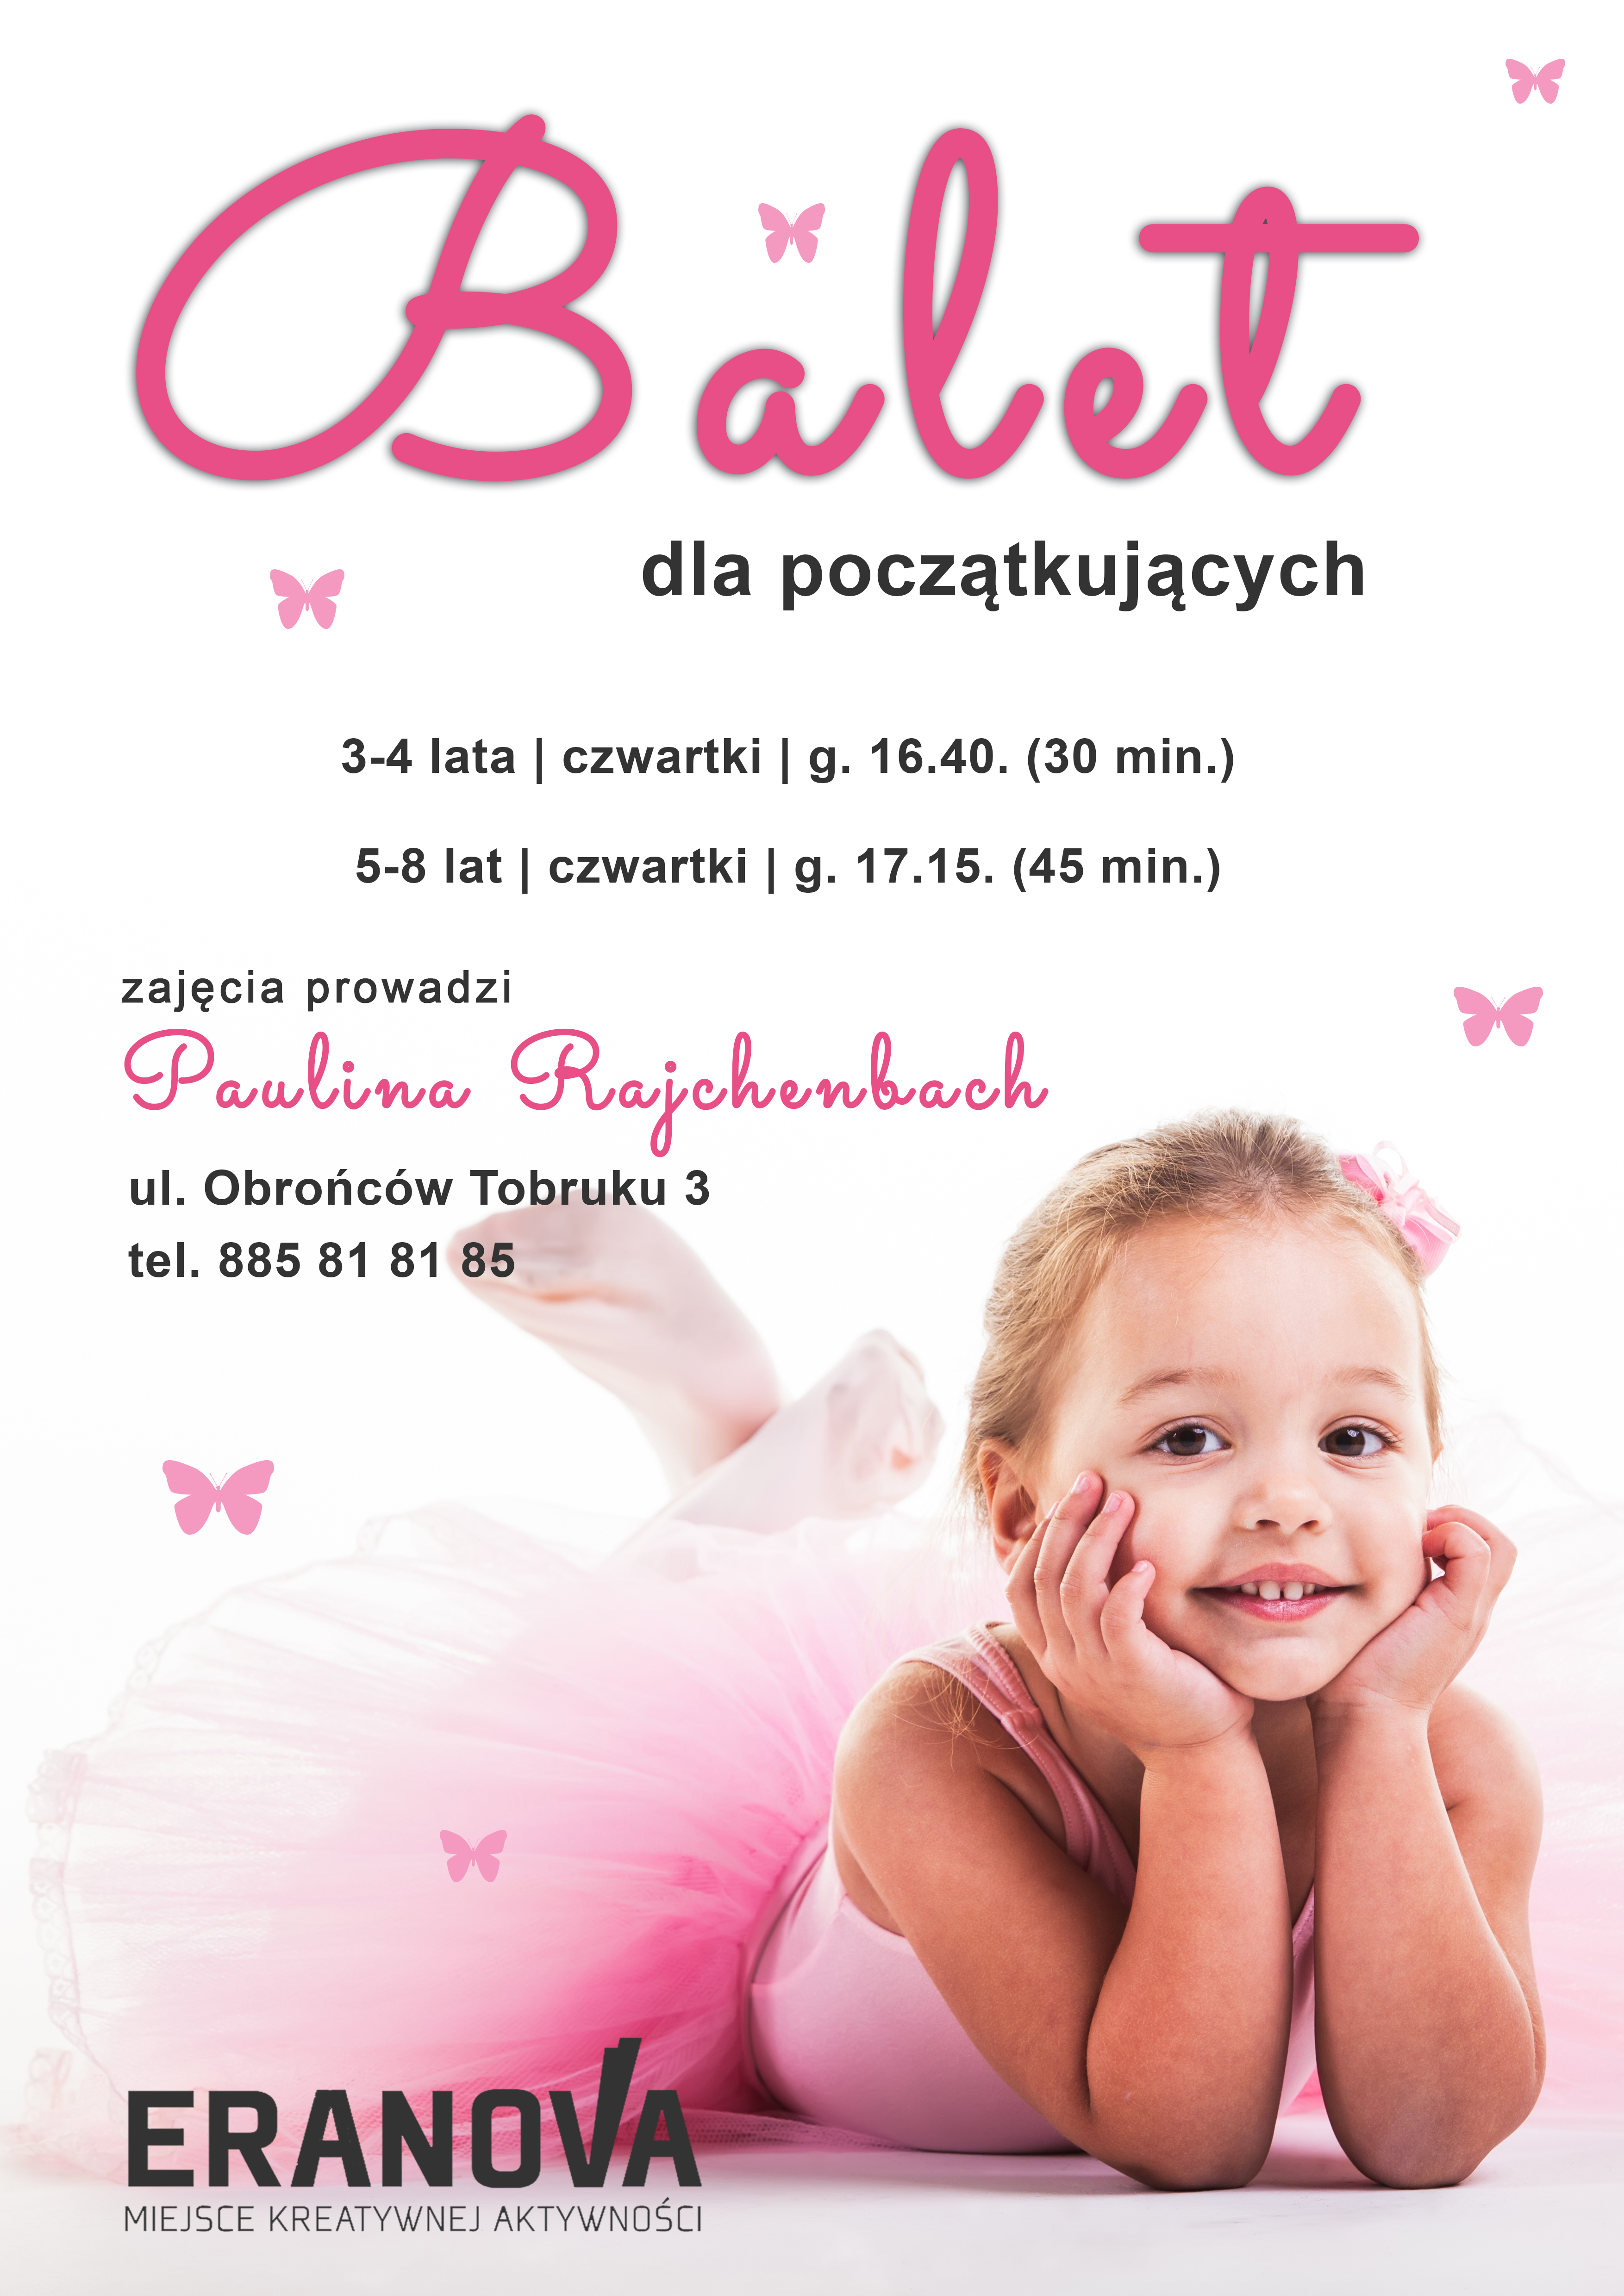 http://m.eranova.pl/2019/10/orig/balet-da-poczatkujaycyc-3105.jpg